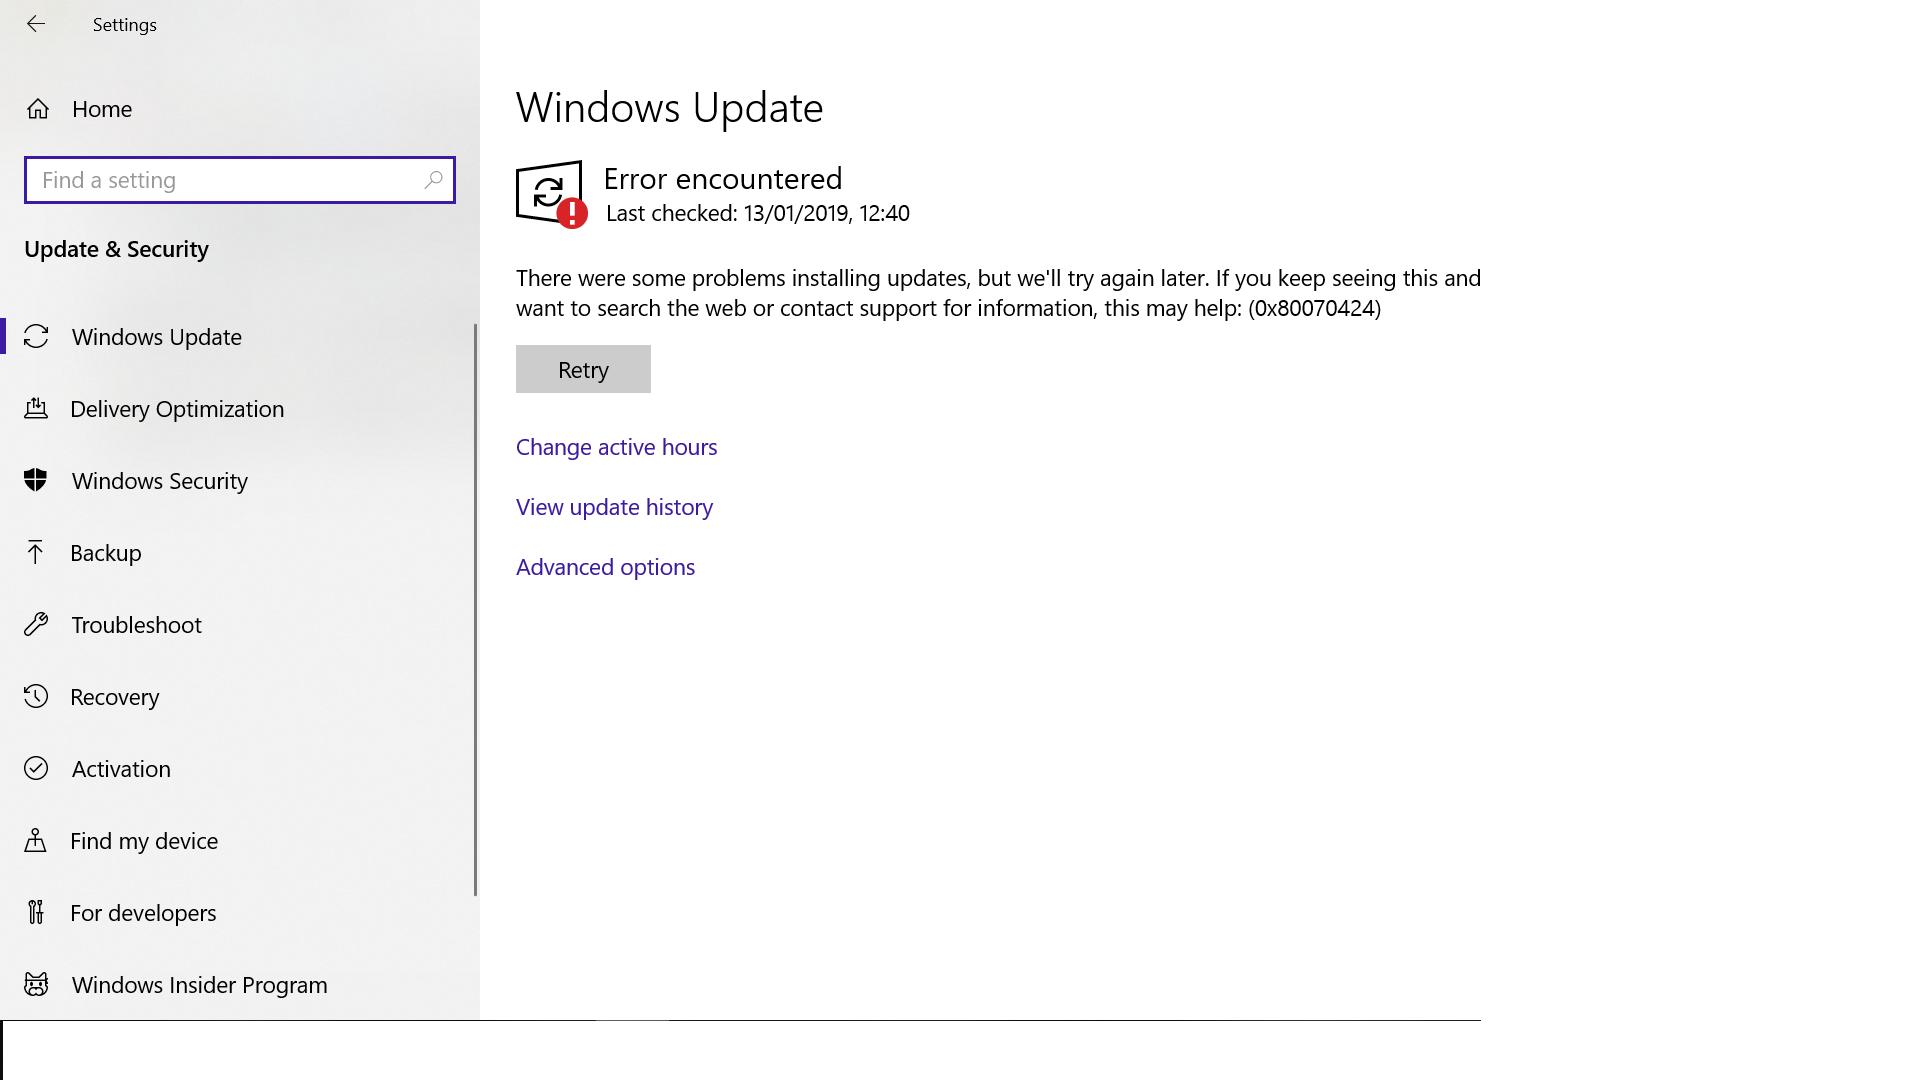 Windows Updates Error on Windows 10: 0x80070424 - Microsoft Community